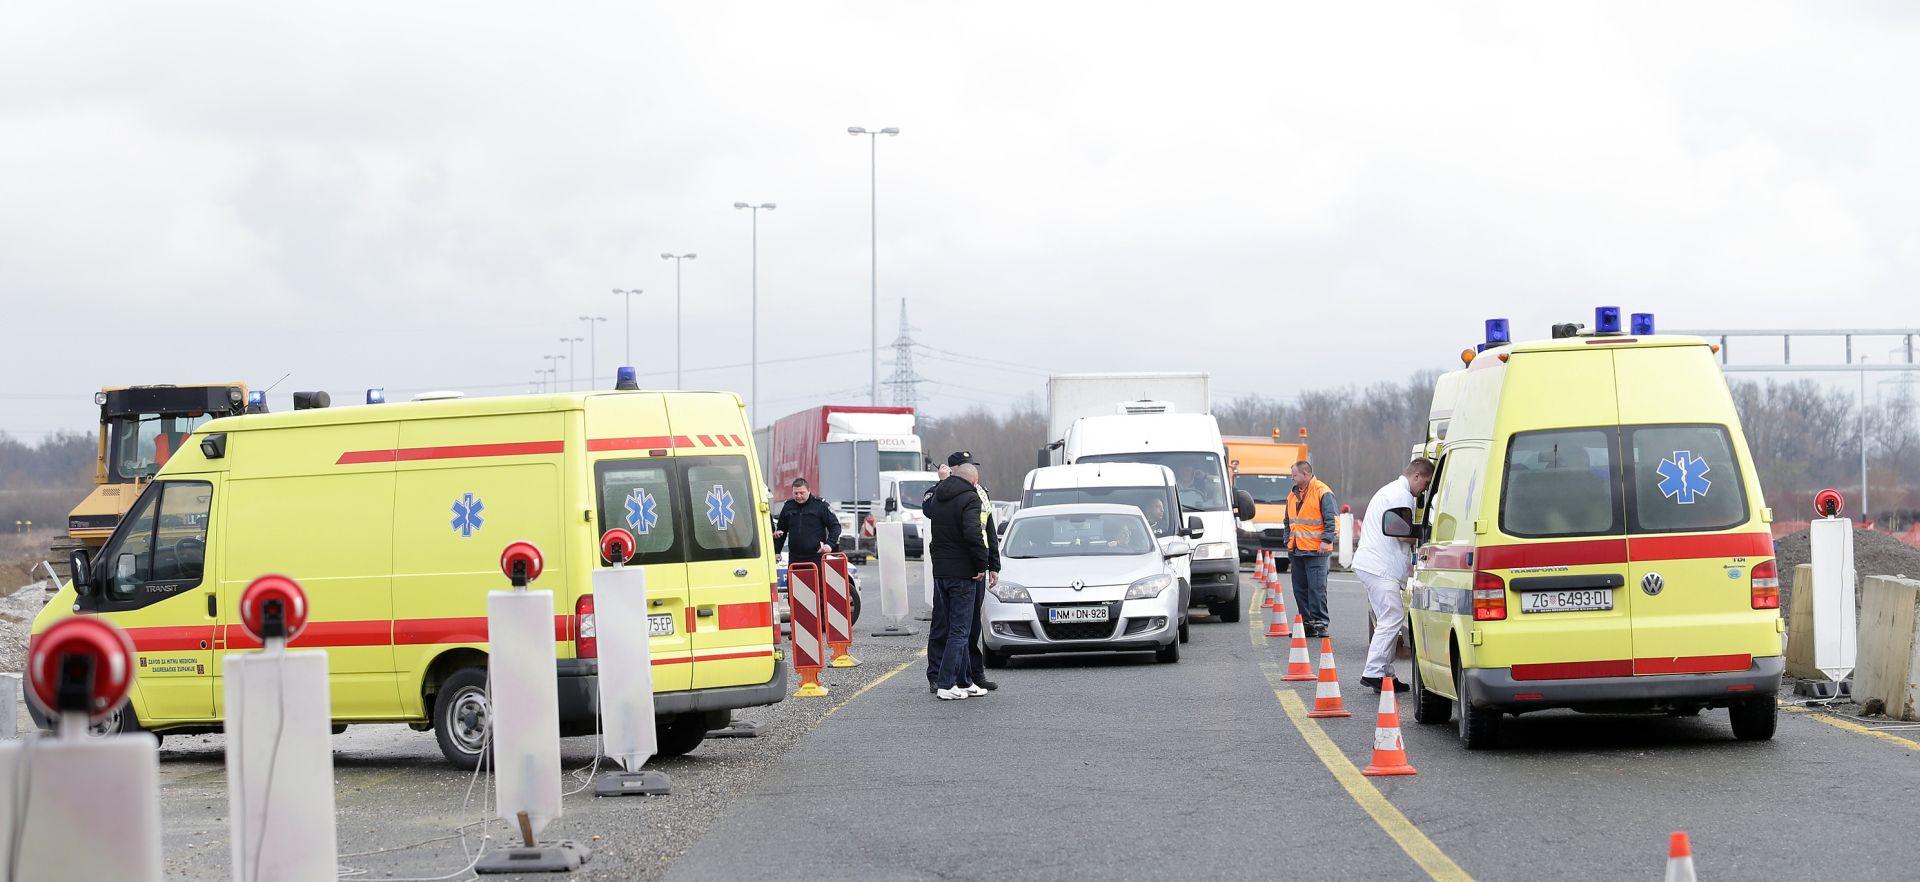 PROMETNA NESREĆA KOD TUNELA SVETI ROK: Kamion naletio na automobil, jedna osoba poginula